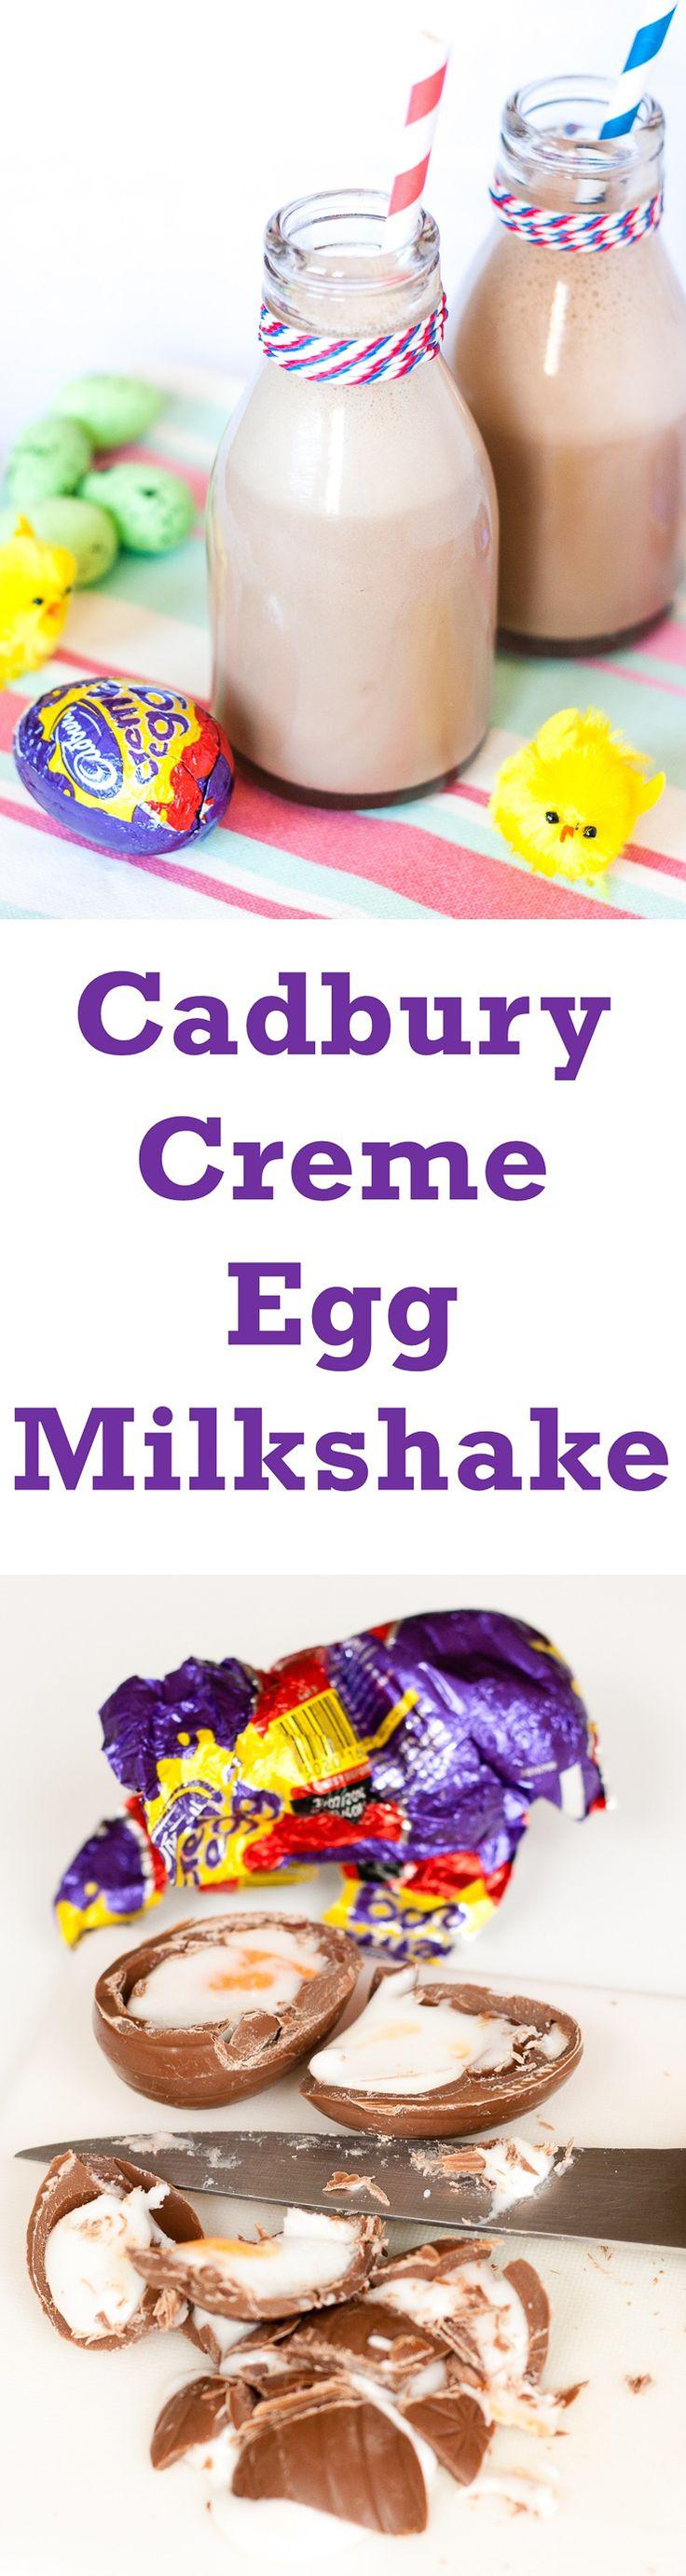 Cadbury Creme Egg Milkshake (Vegetarian)